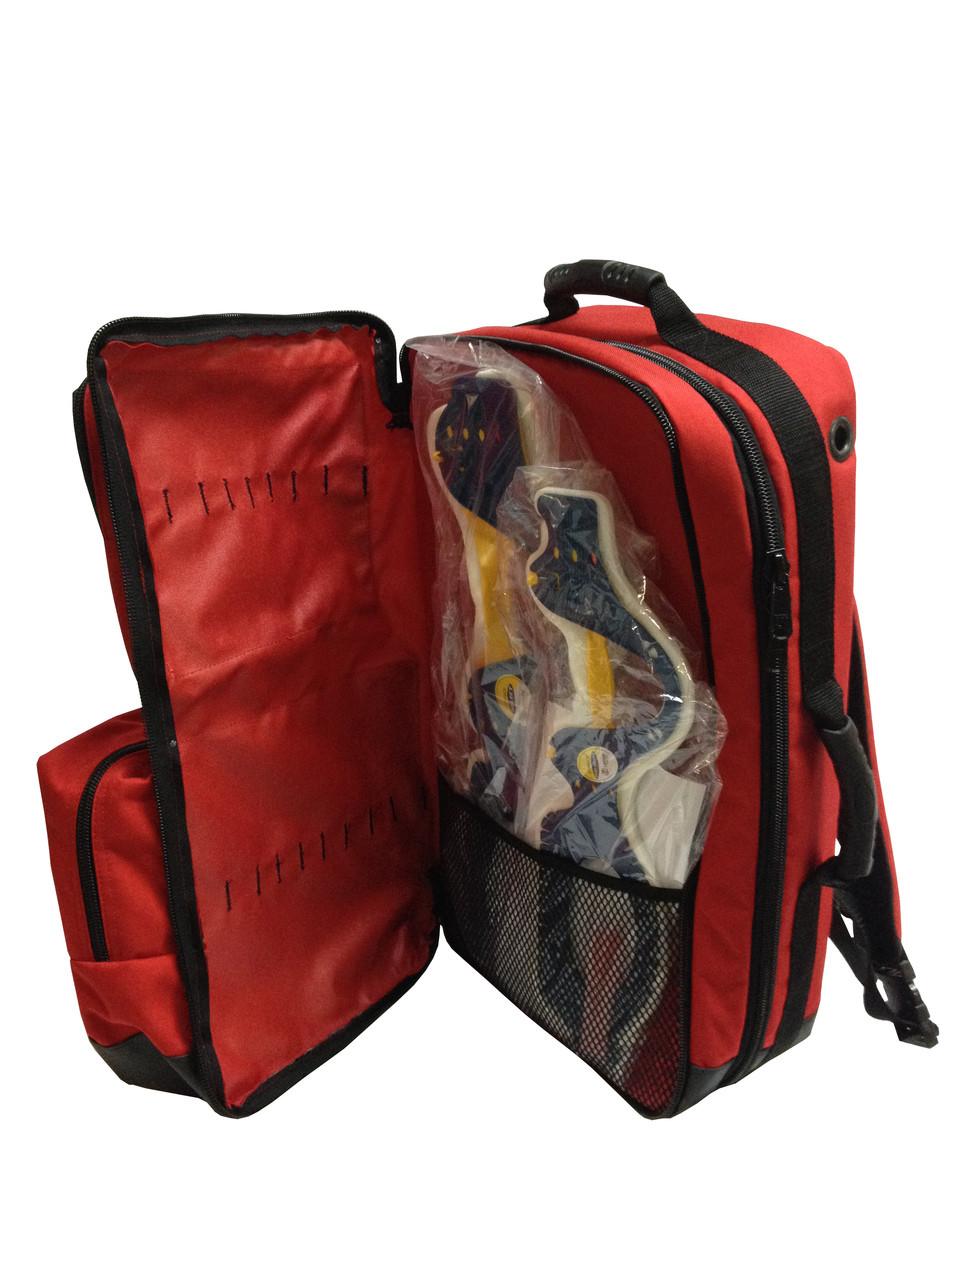 Stocked - O2 / Trauma / AED Backpack